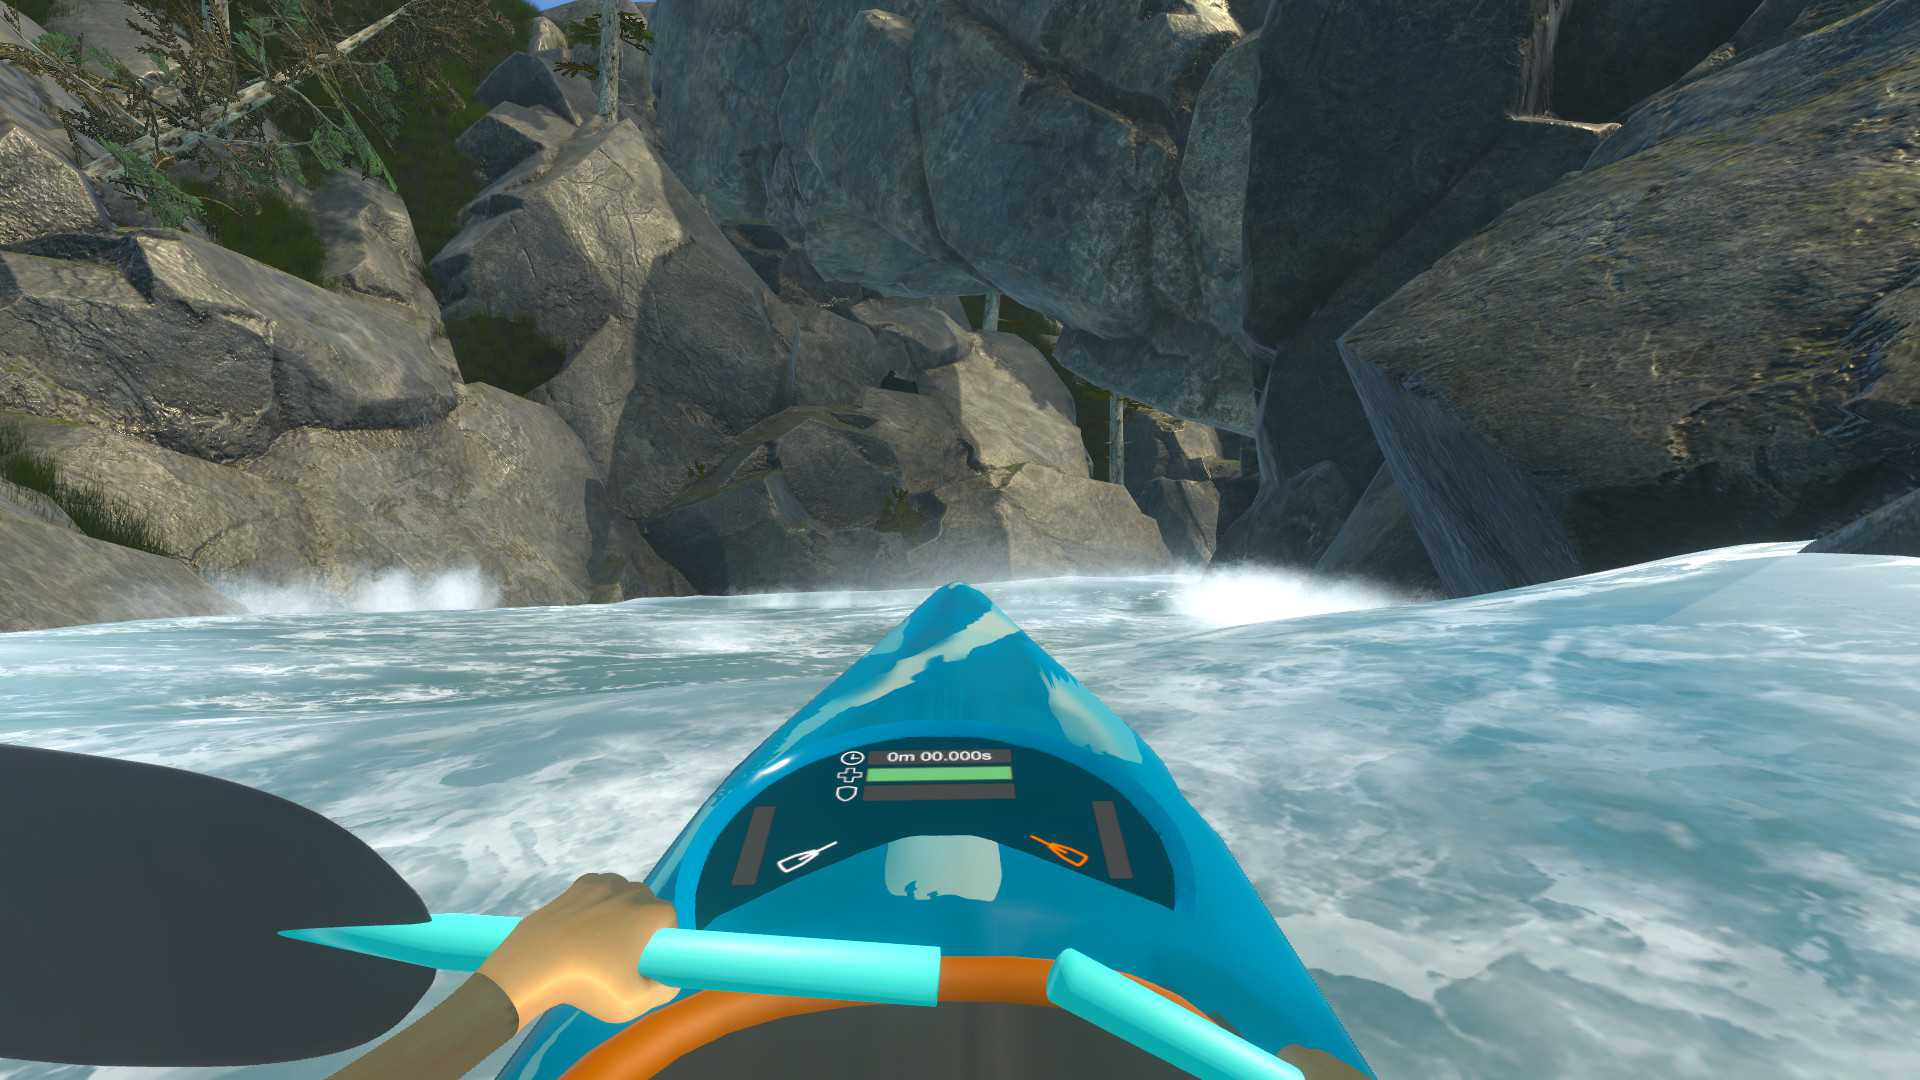 Downstream Vr Whitewater Kayaking Pc